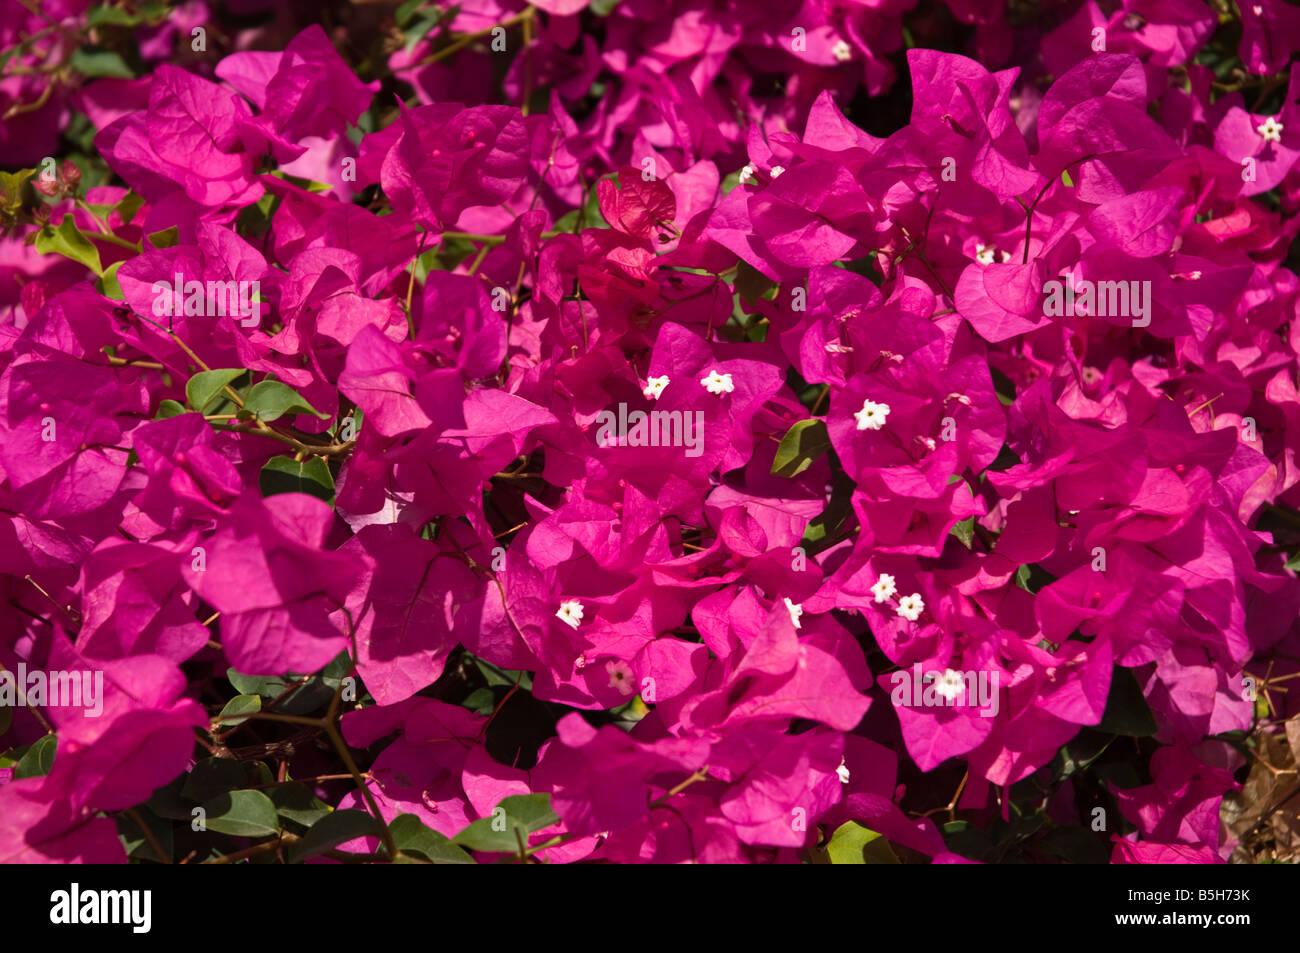 Dh Bougainvillea Lanzarote Purple Flowering Bougainvillea Bush Stock